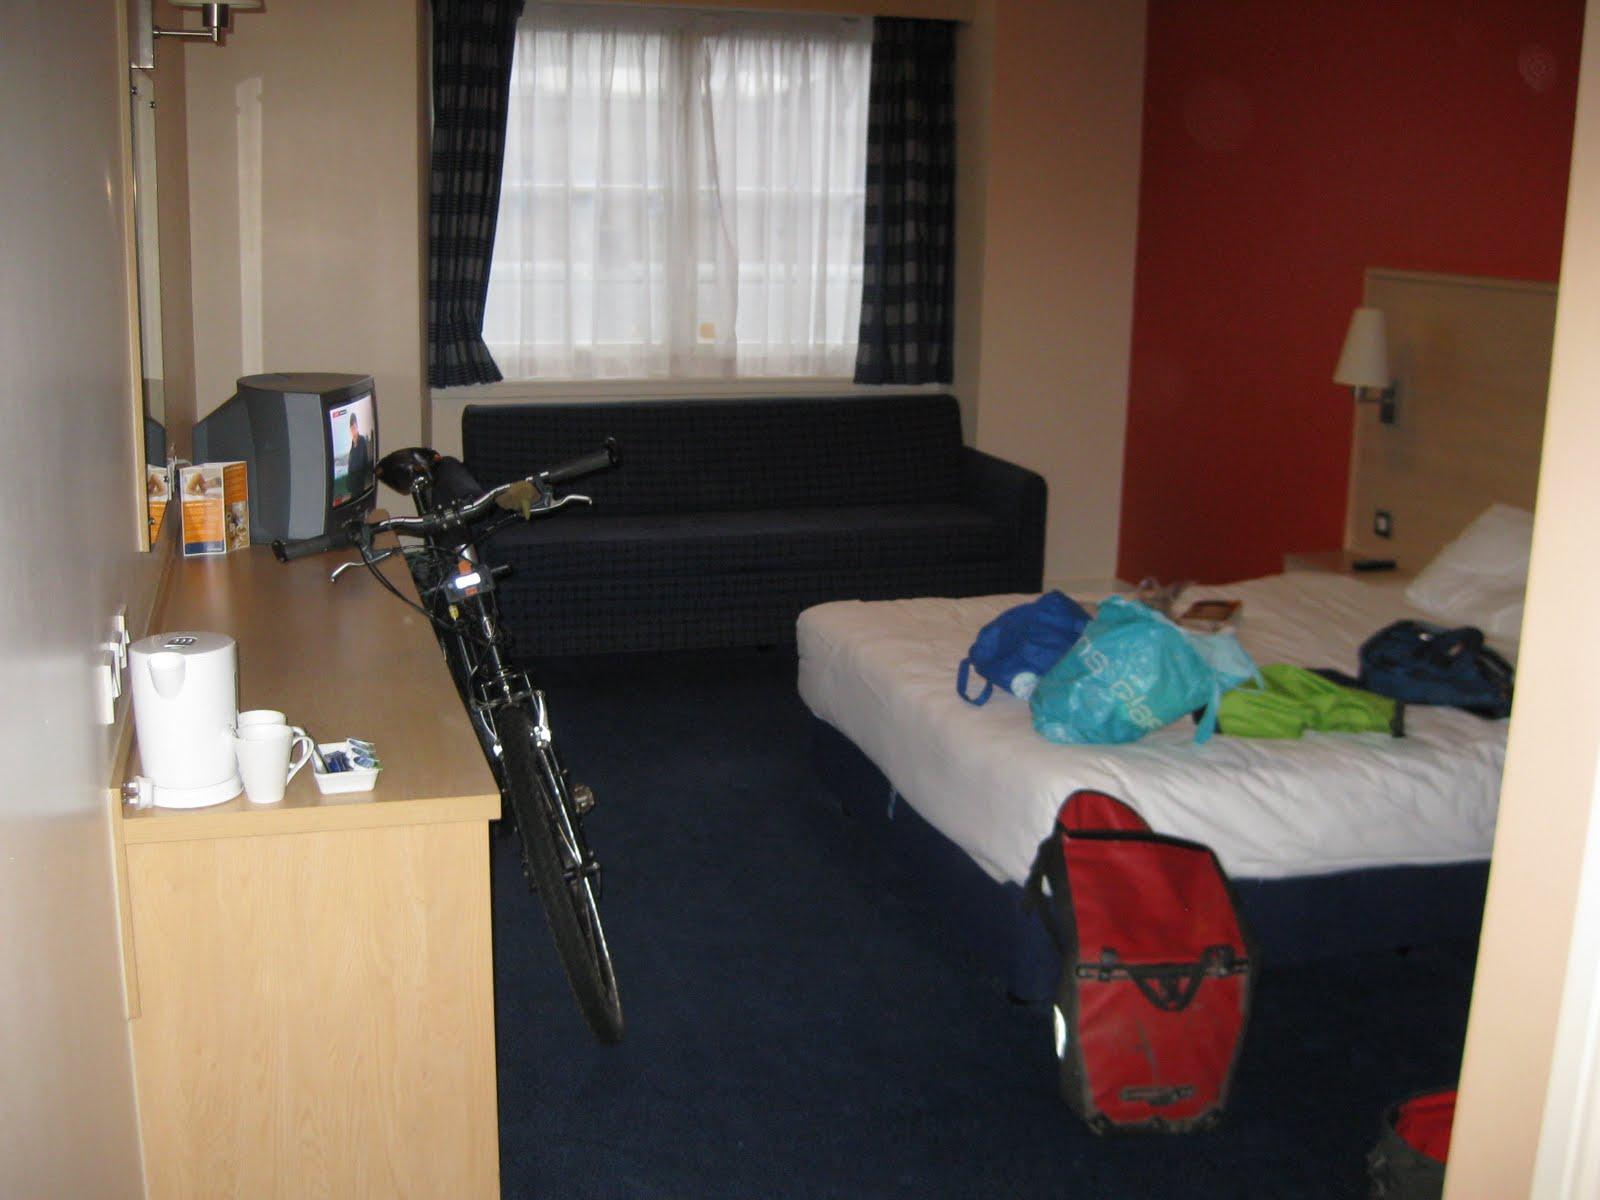 Where the bike belongs, in the bedroom